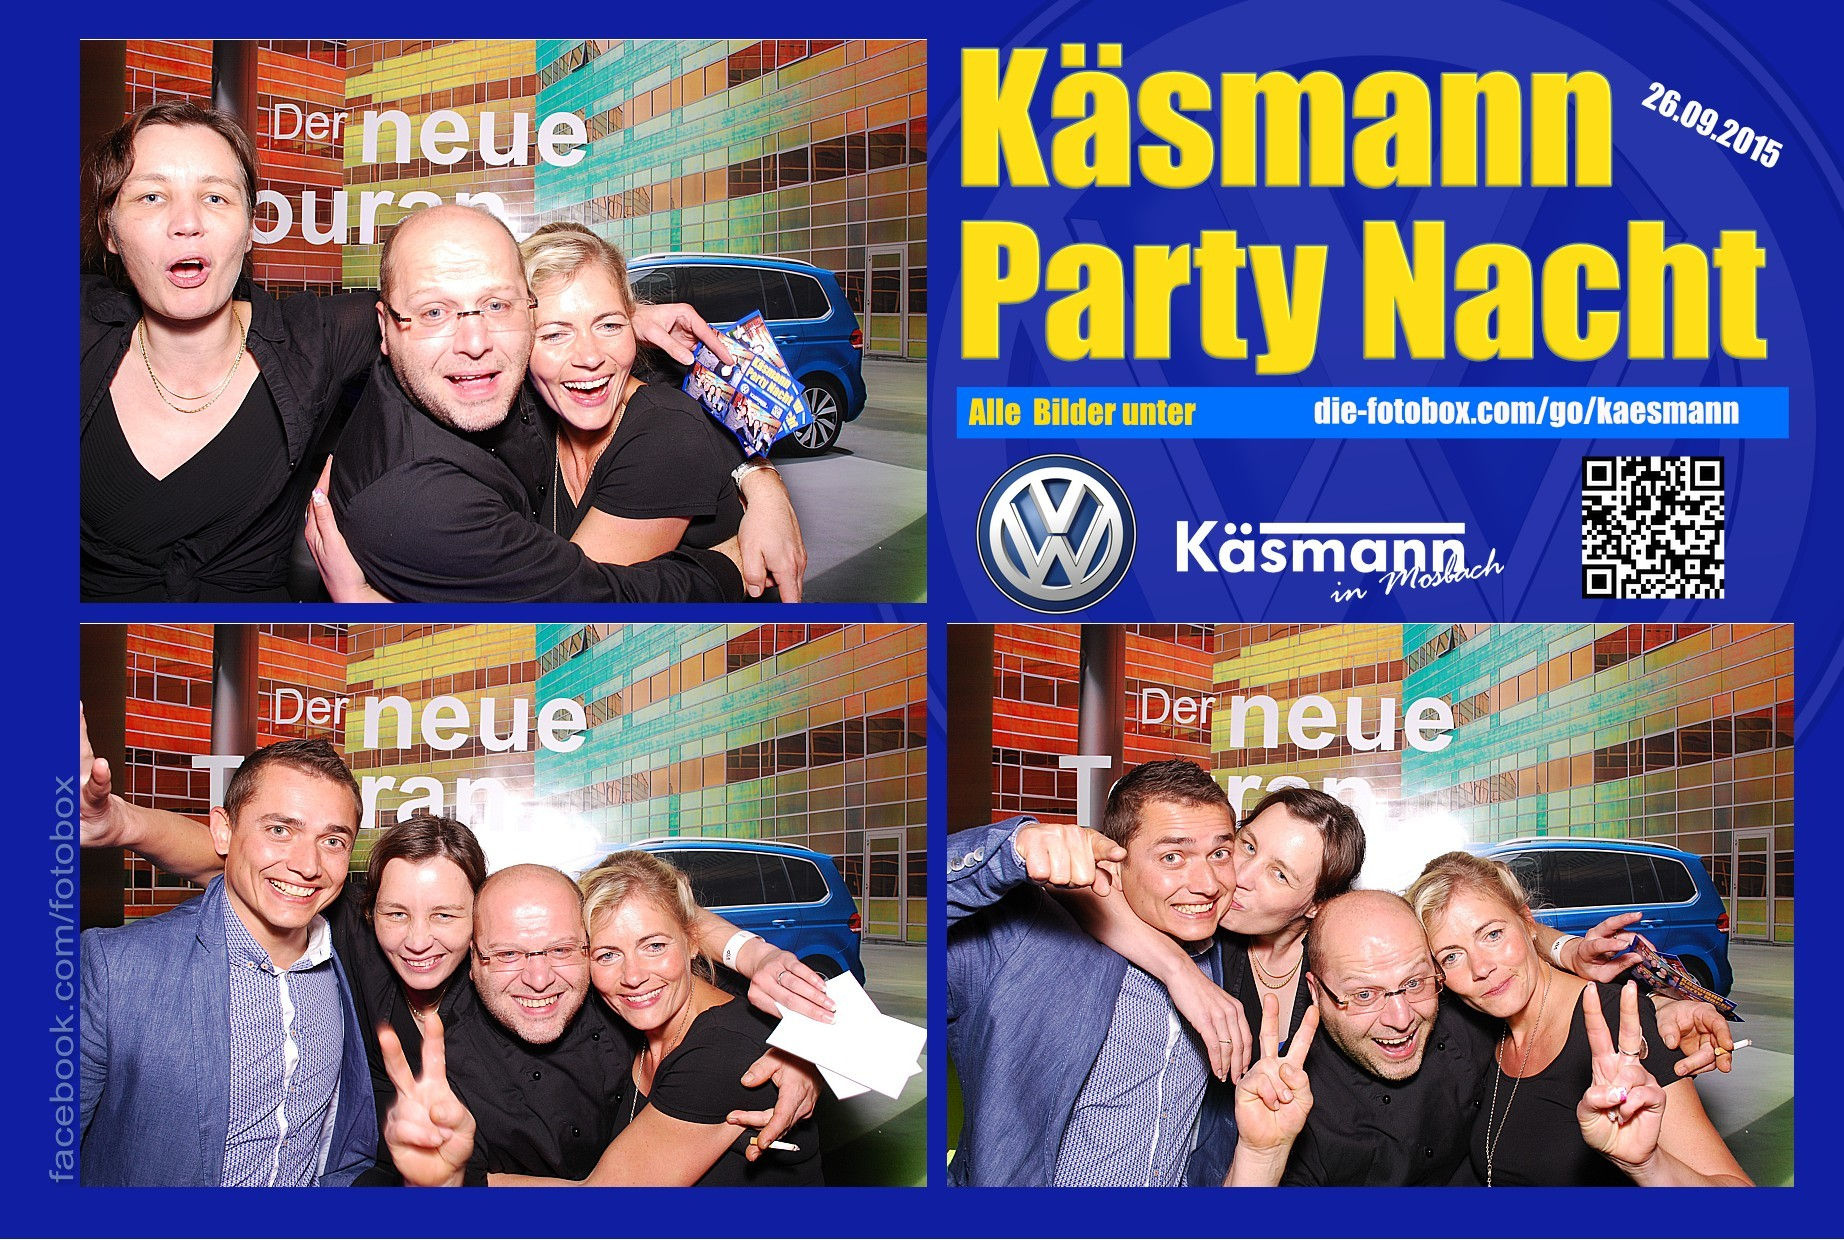 Käsmannparty 2015 - www.die-fotobox.com 01300